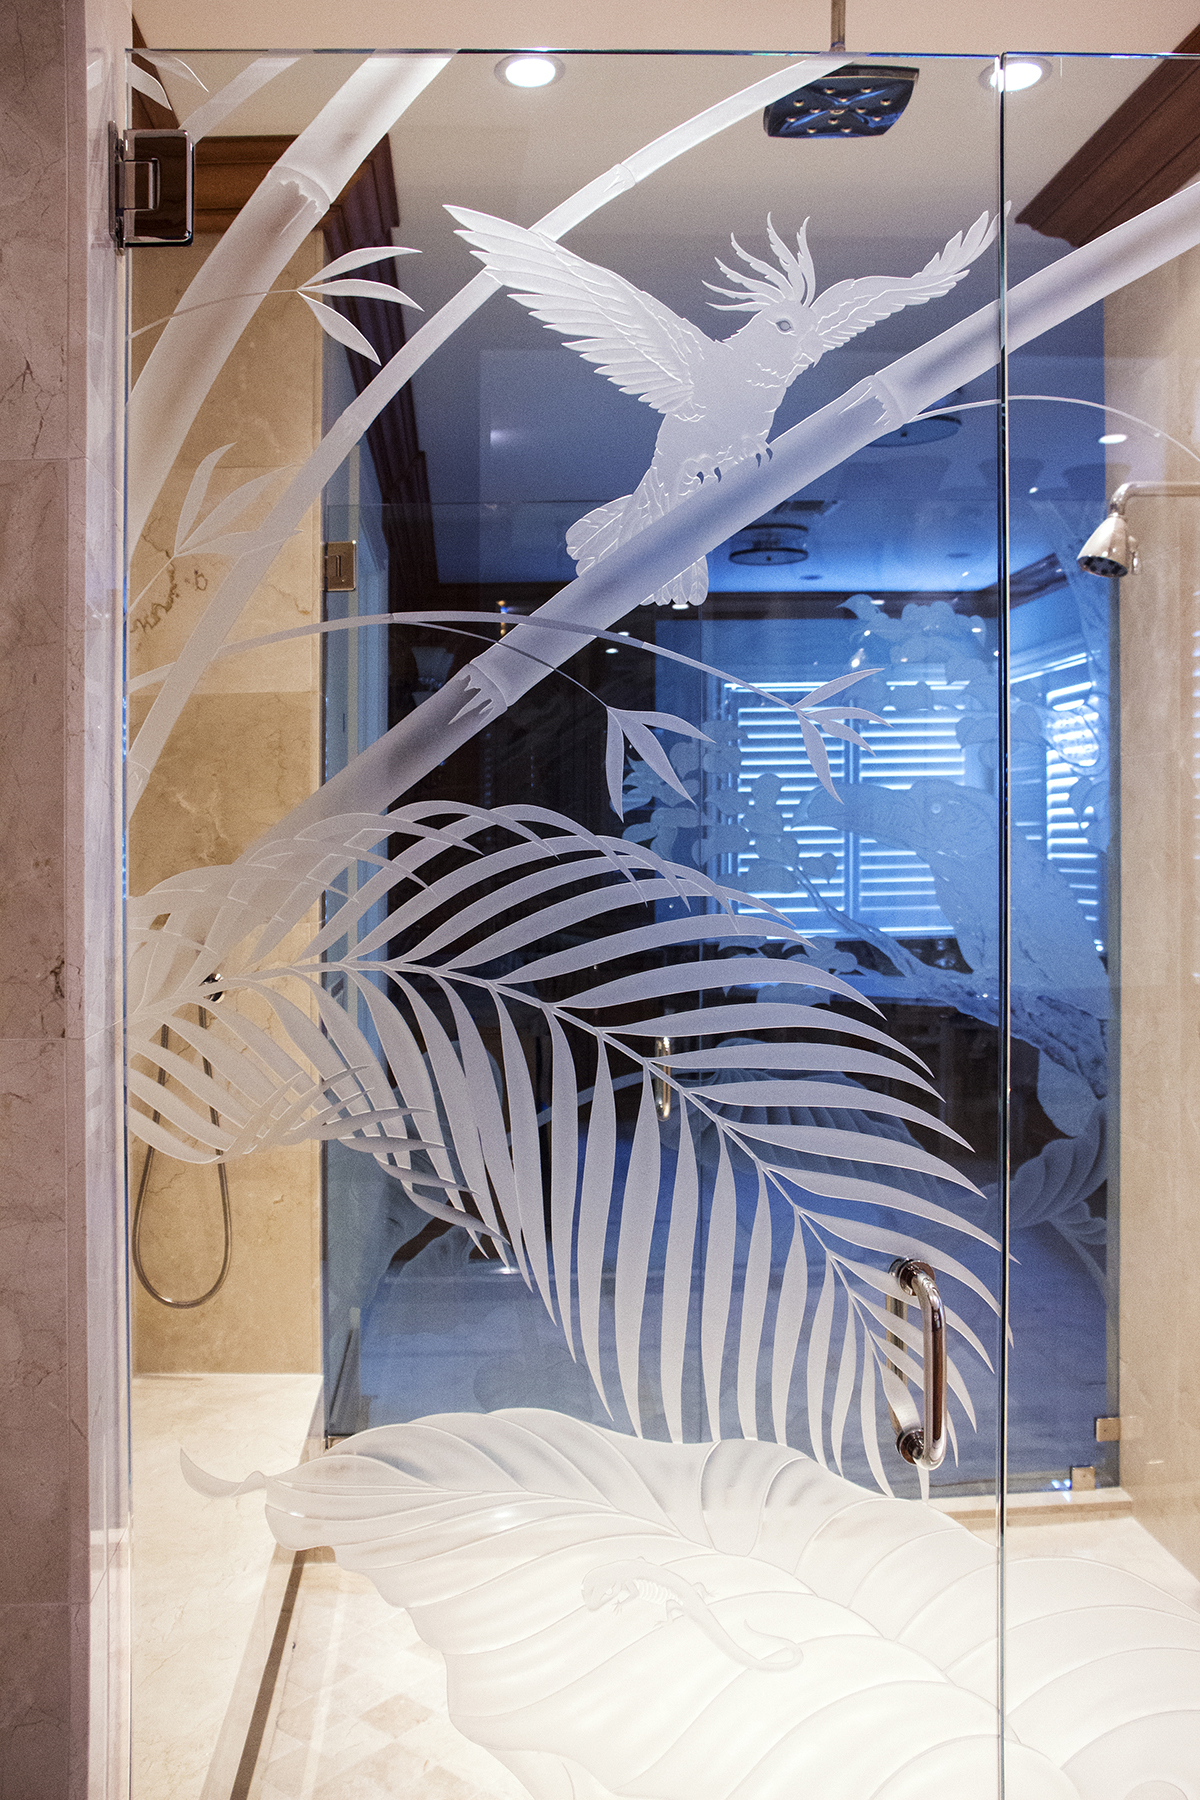 1800 #245FA7 Tropical Shower Door Back Entrance wallpaper Etched Glass Front Doors 39351200